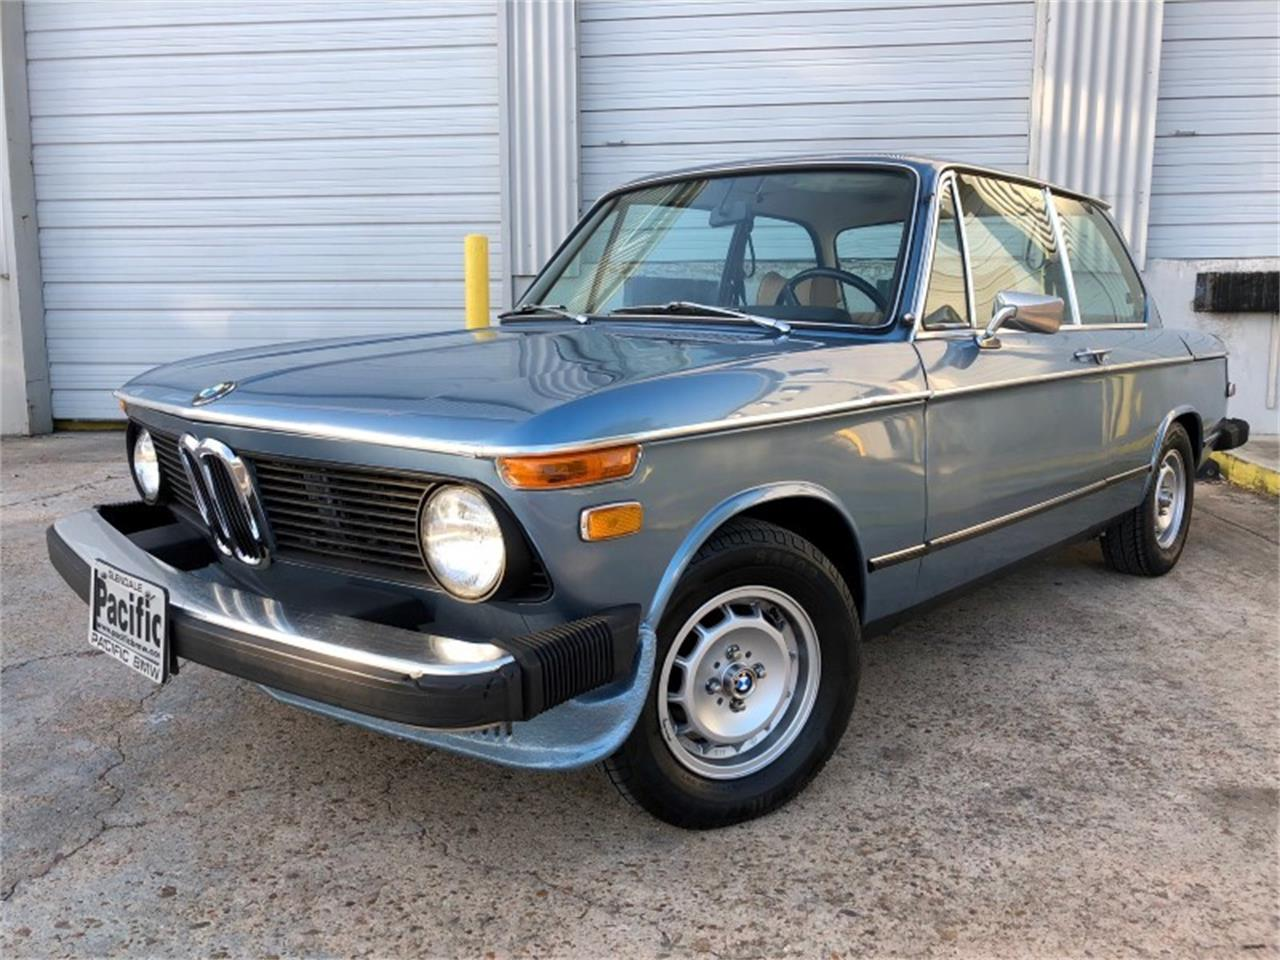 BMW 2002 For Sale >> 1975 Bmw 2002 For Sale Classiccars Com Cc 1210379